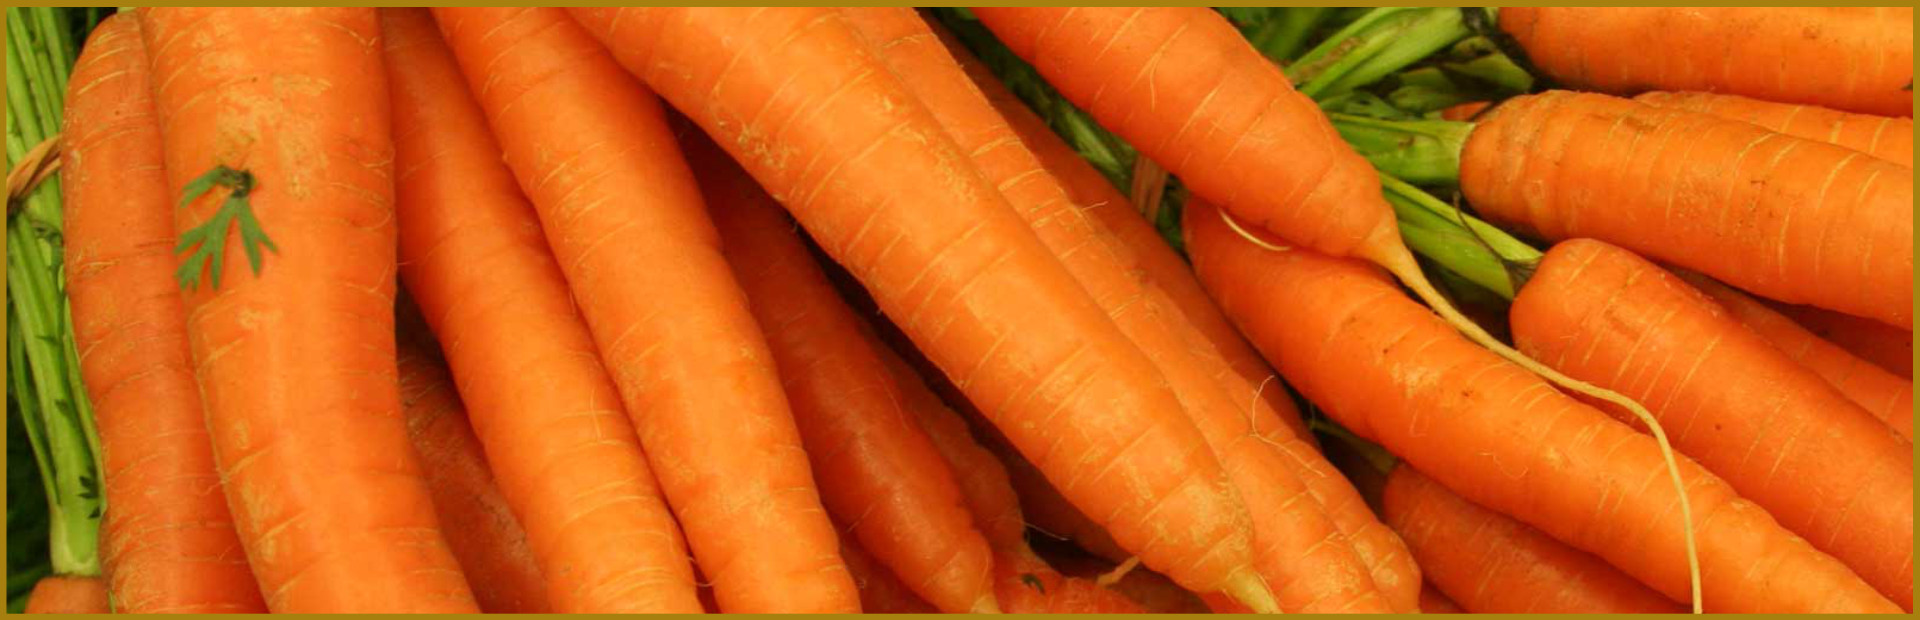 Kühnert Karottentrester